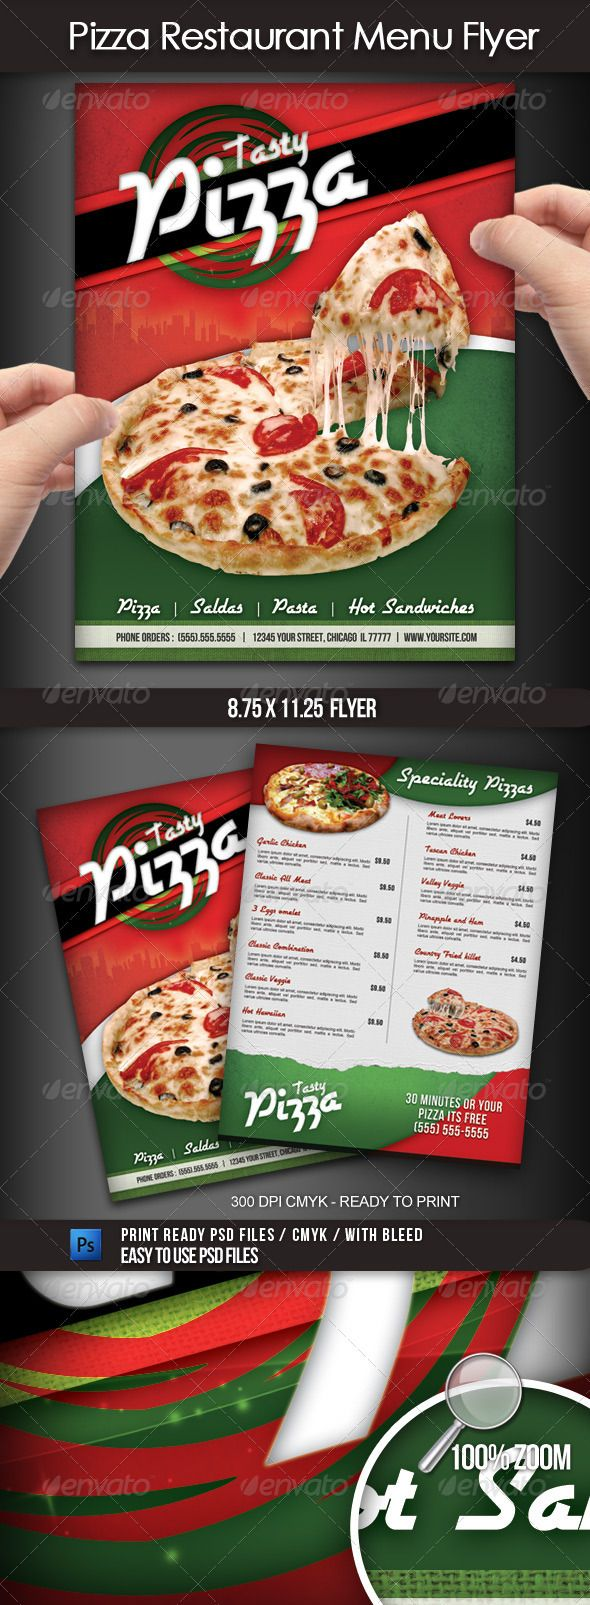 Pizza Restaurant Menu Flyer – Sample Pizza Menu Template